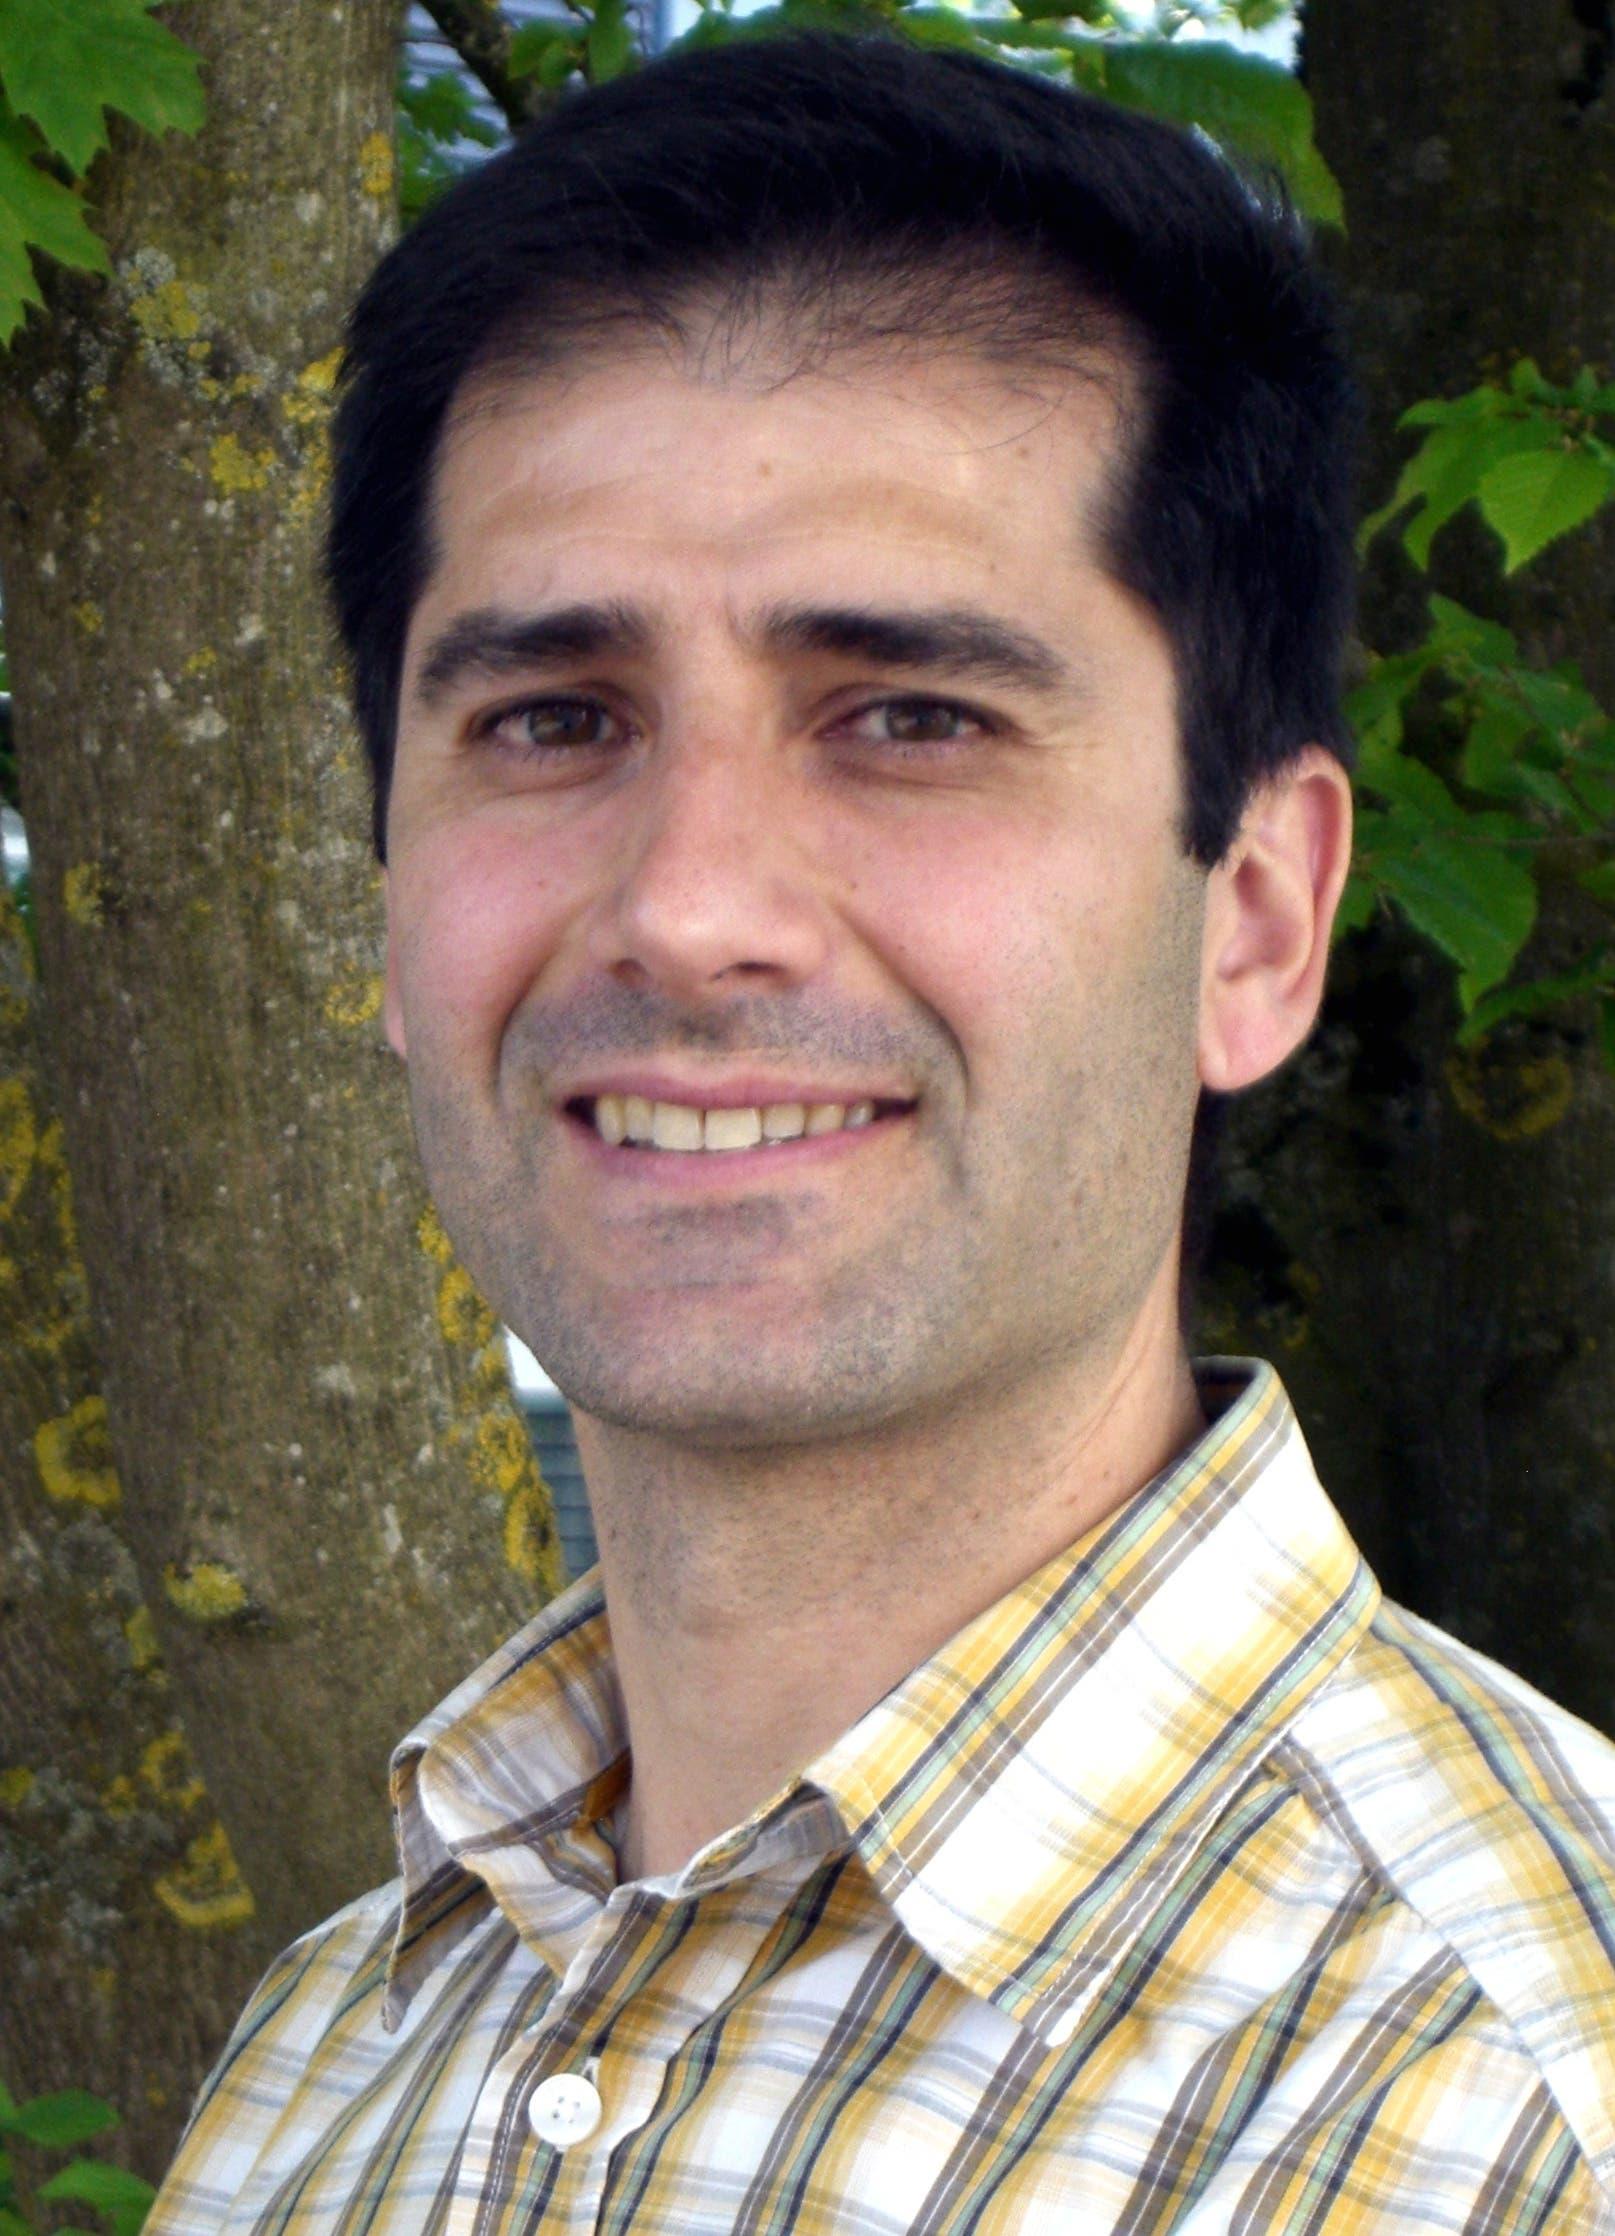 Jose Antonio Garrido